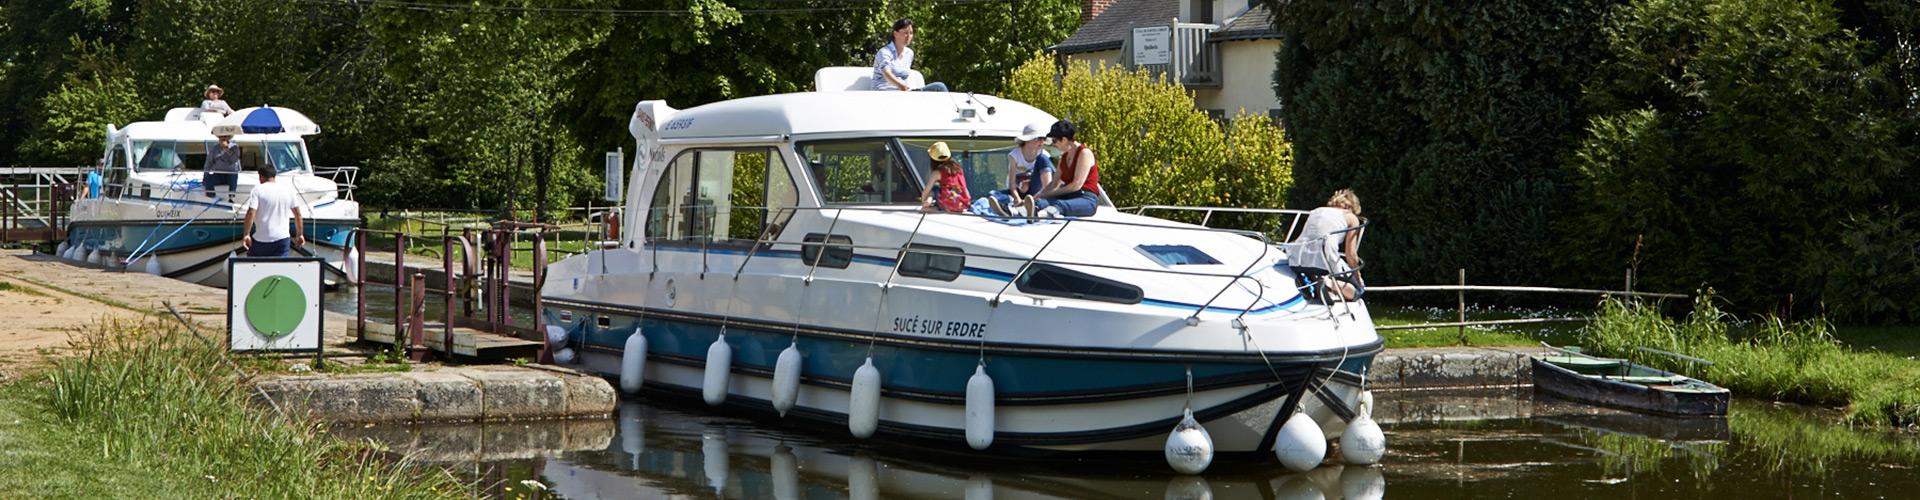 tarifs location de bateau sans permis nantes. Black Bedroom Furniture Sets. Home Design Ideas